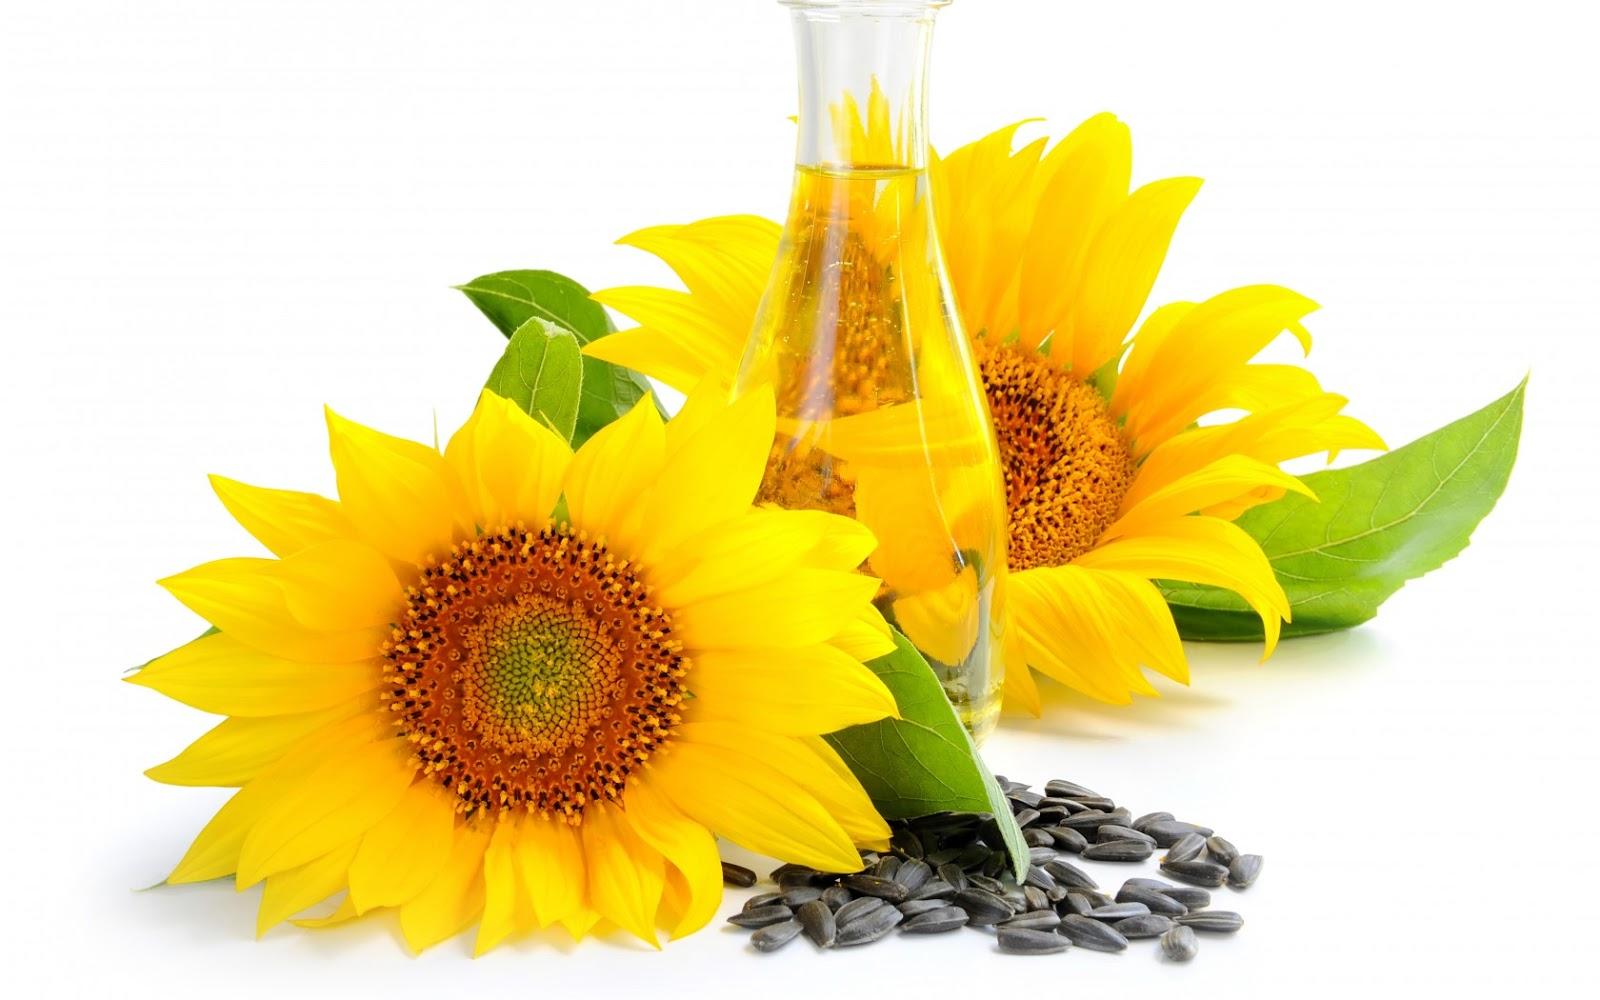 Ingredientes Naturales: Aceite de Girasol | Sidi Beauty